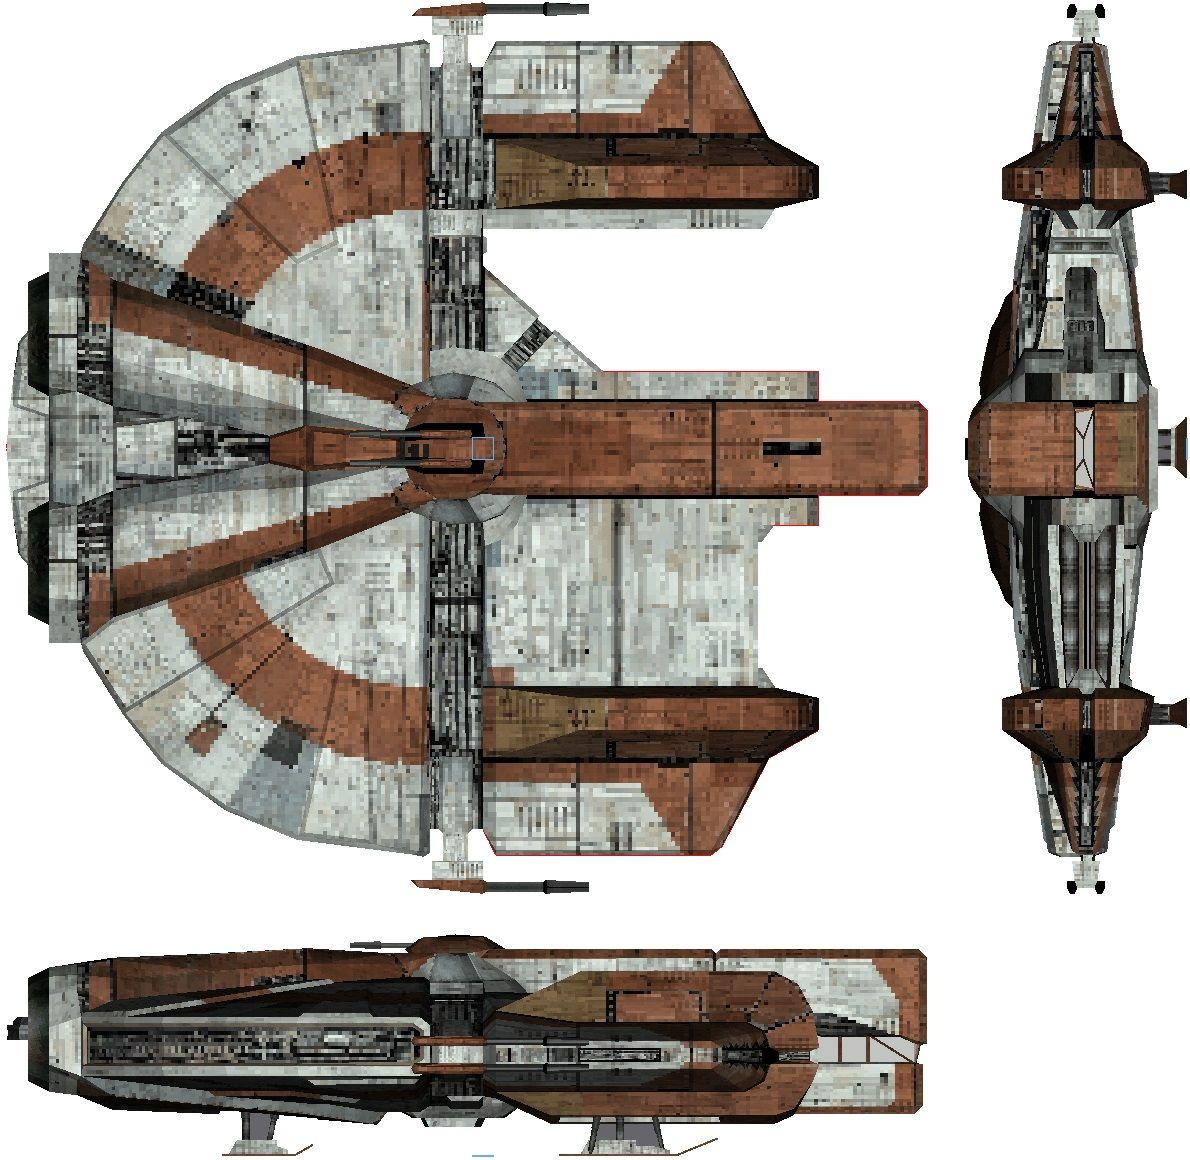 The Ebon Hawk Star Wars Kotor Star Wars Art Star Wars Ships Hd retexture of the ebon hawk in black and gray colors. pinterest